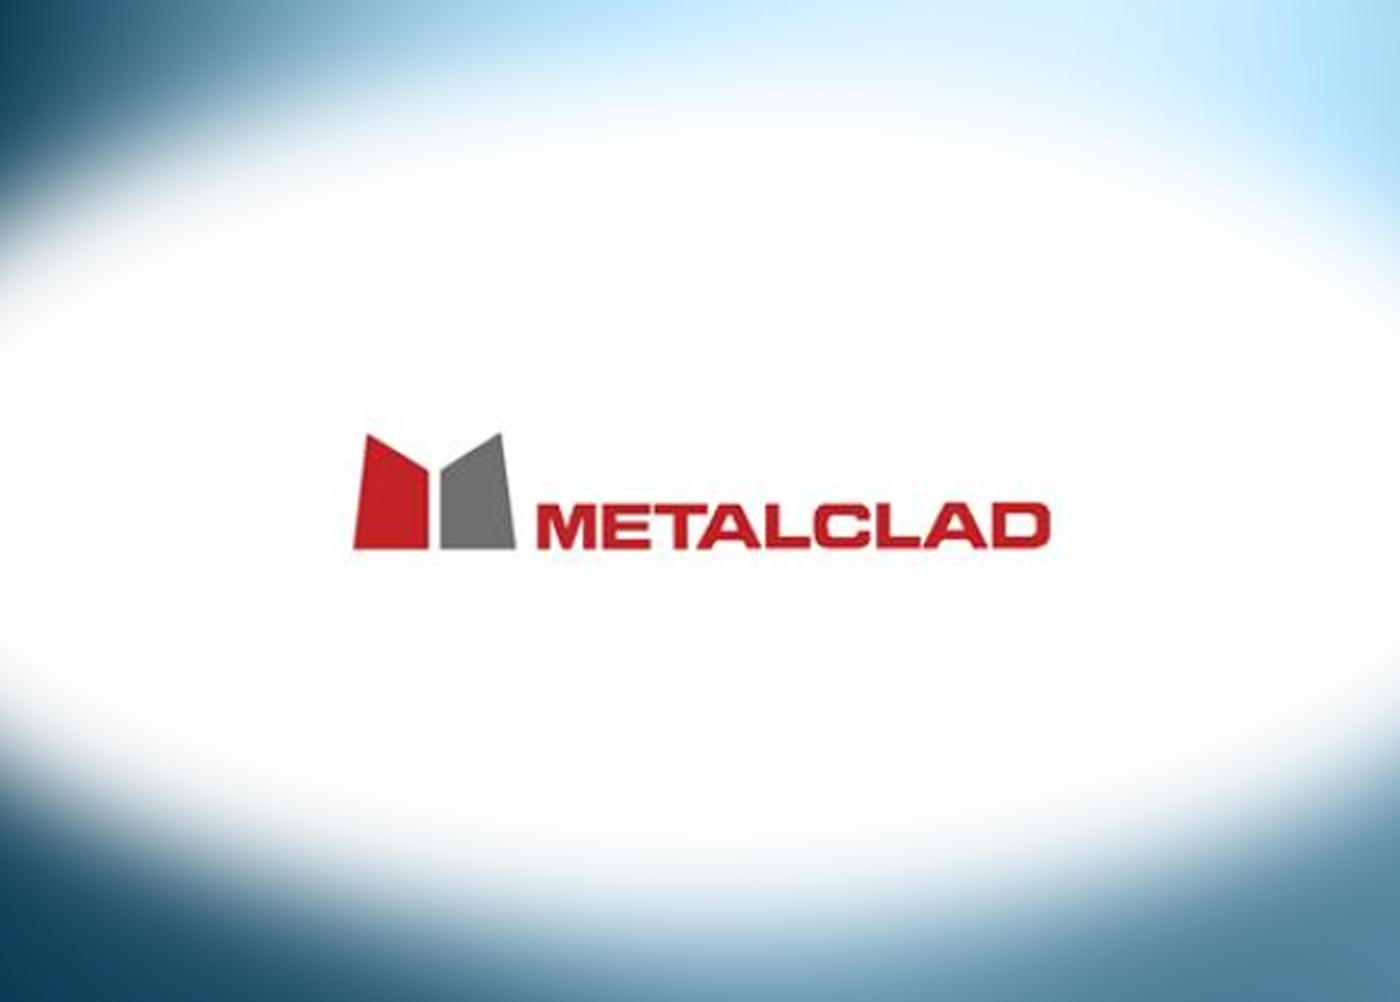 Metalclad Insulation Company Logo